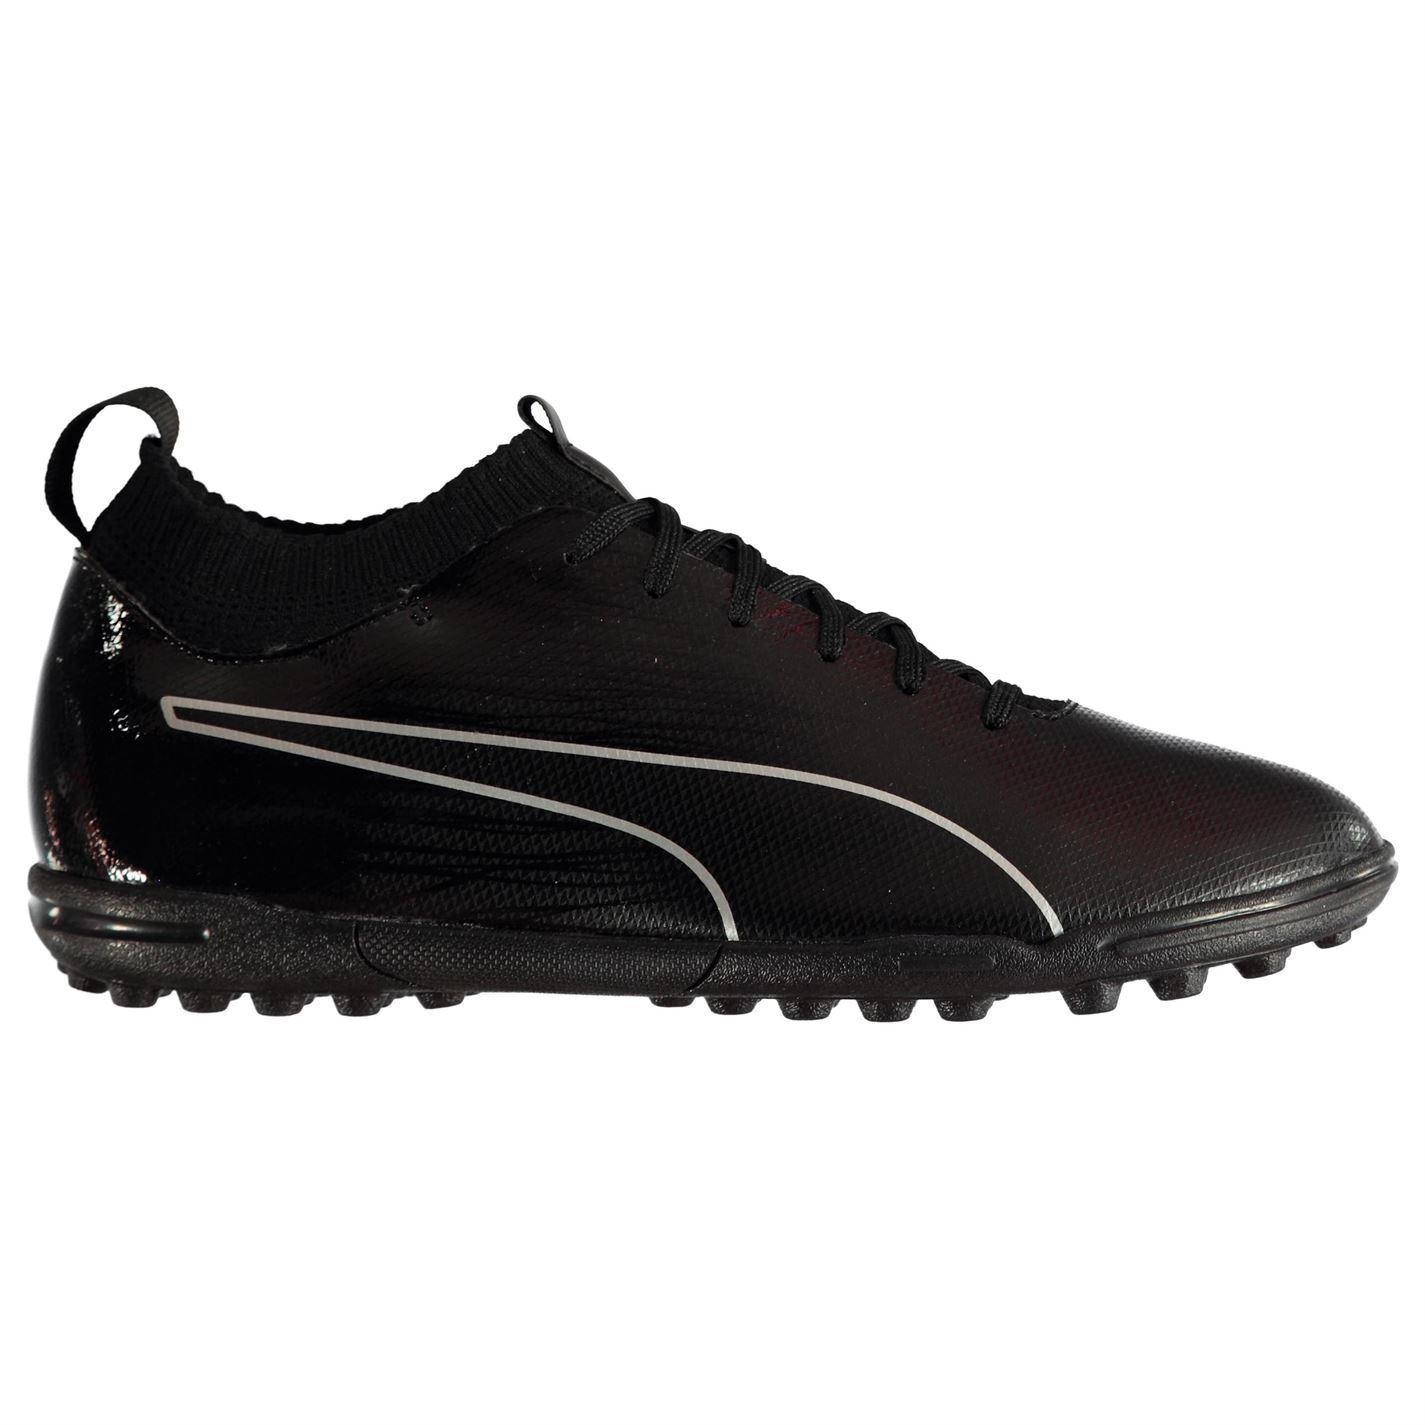 Puma evoknit Astro Turf Scarpe da ginnastica calcio Uomo Nero Scarpe da calcio scarpe da ginnastica